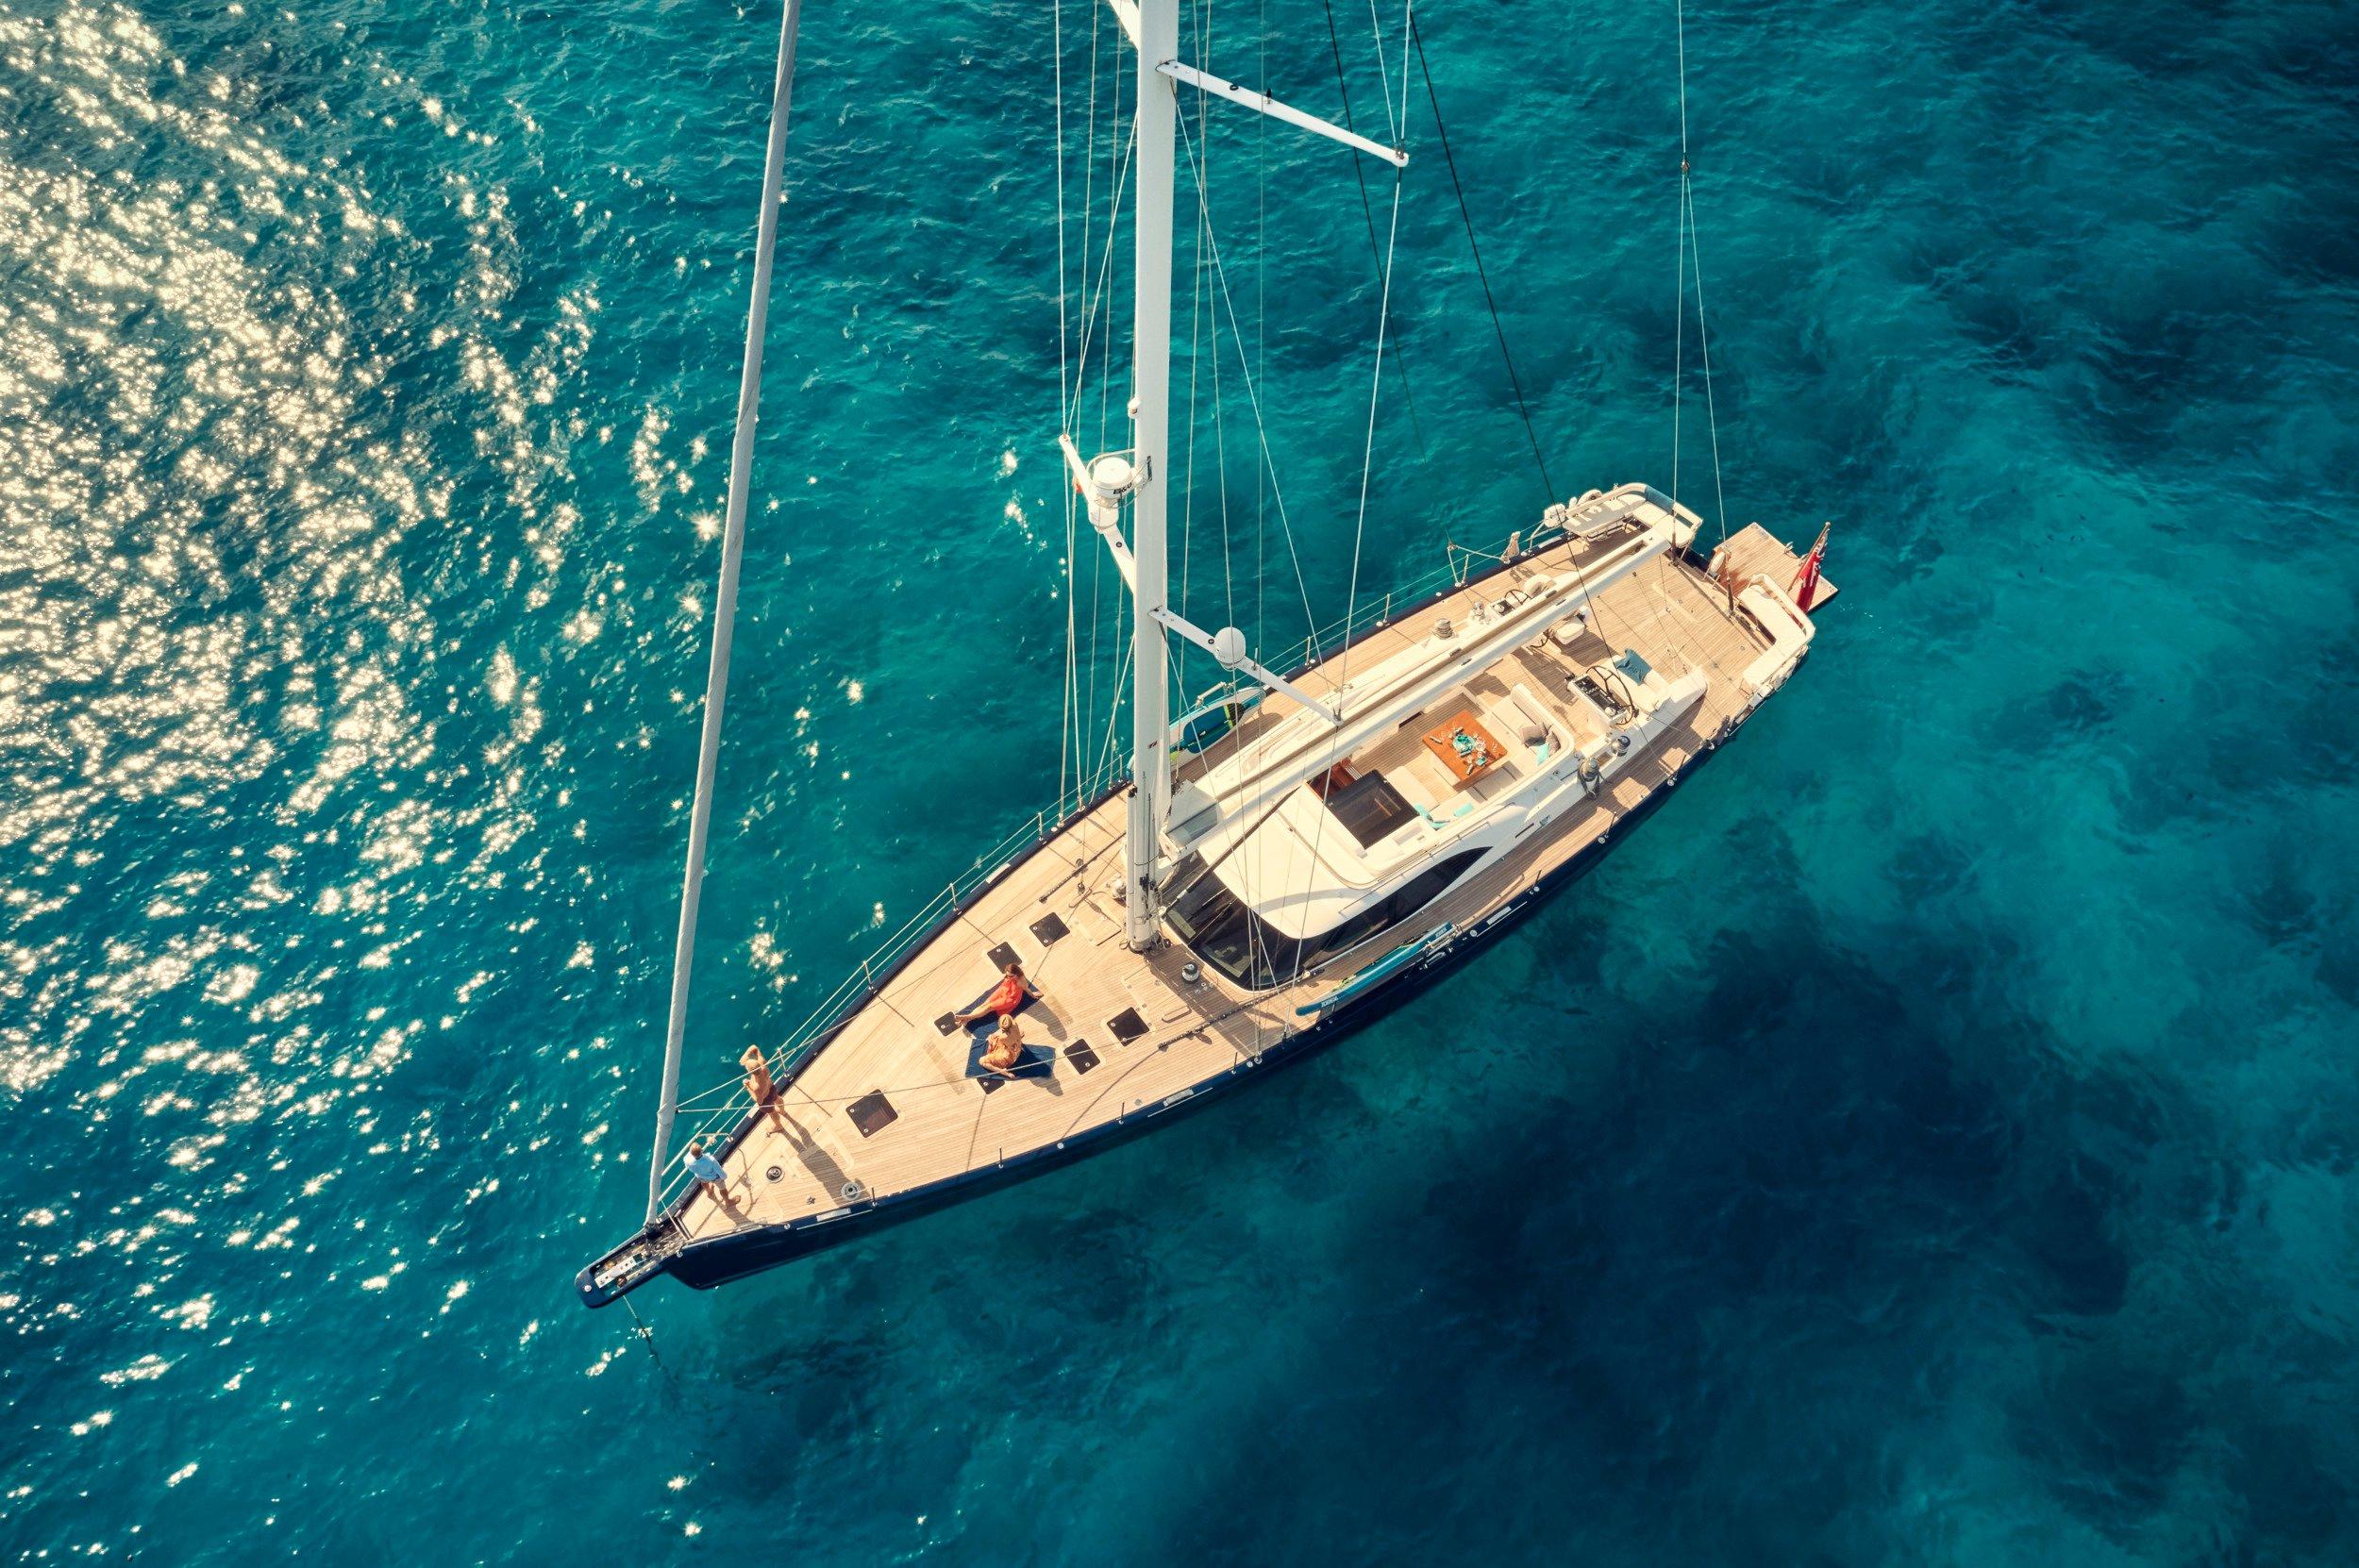 Boat RV Louver Vent Ventilation Air Vent for Marine Yacht Caravan Door Wall